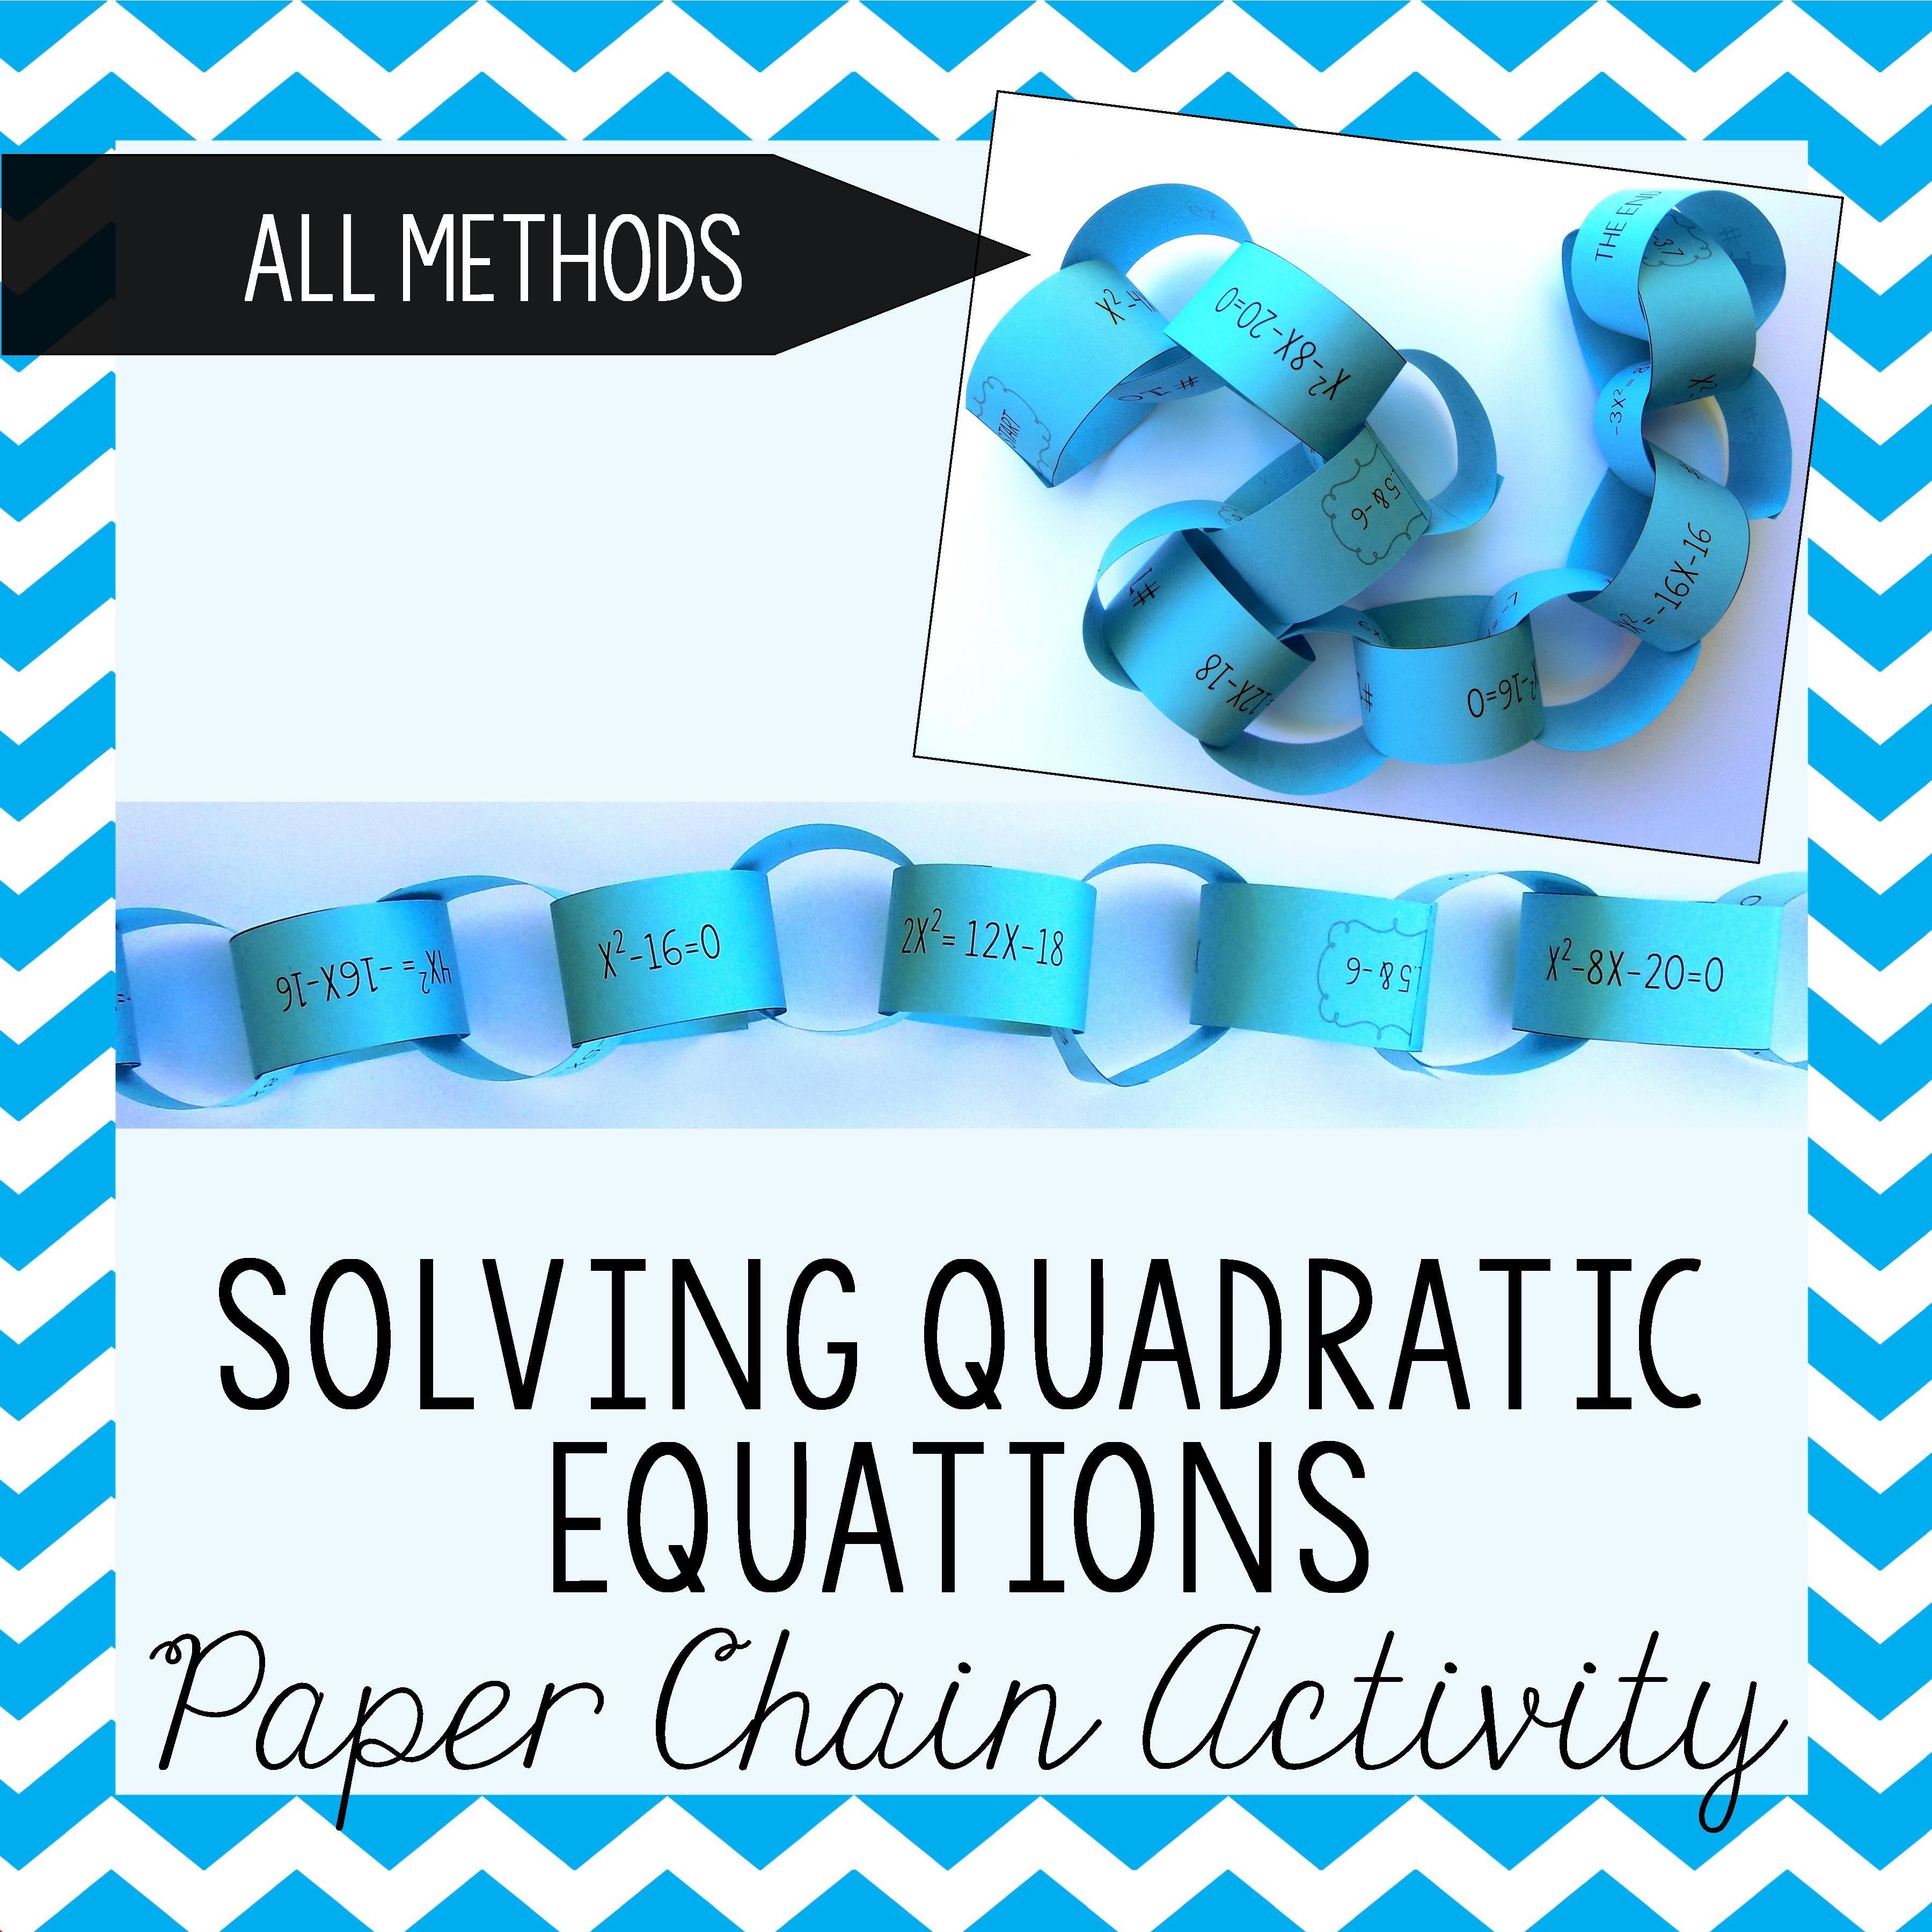 Solving Quadratic Equations Paper Chain Activity – Solving Quadratics by Graphing Worksheet